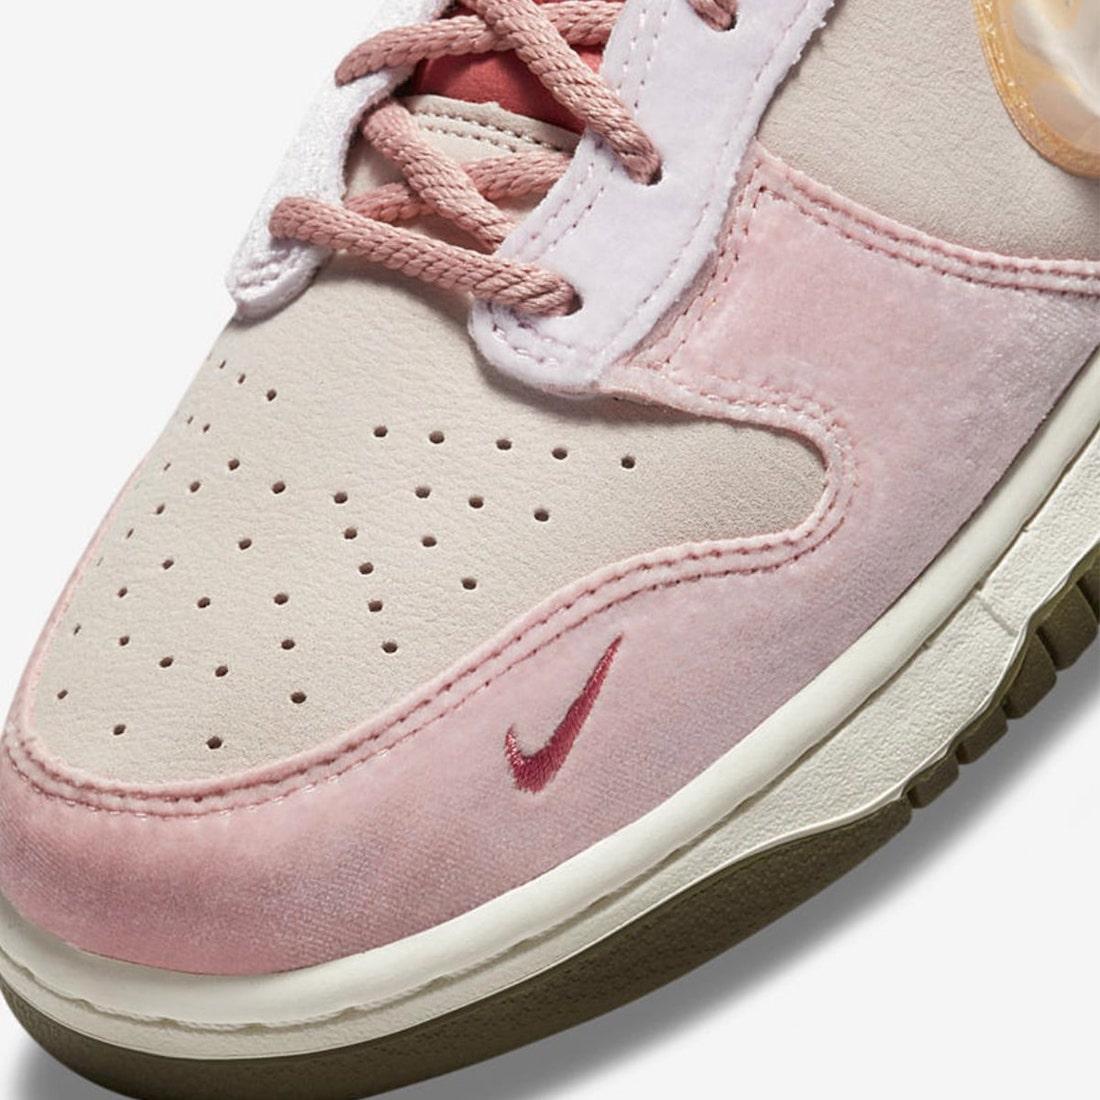 Jordan,A Ma Maniére,Air Jordan  粉嫩不输「情人节」!全新联名 Dunk 曝光!还有特殊鞋盒!